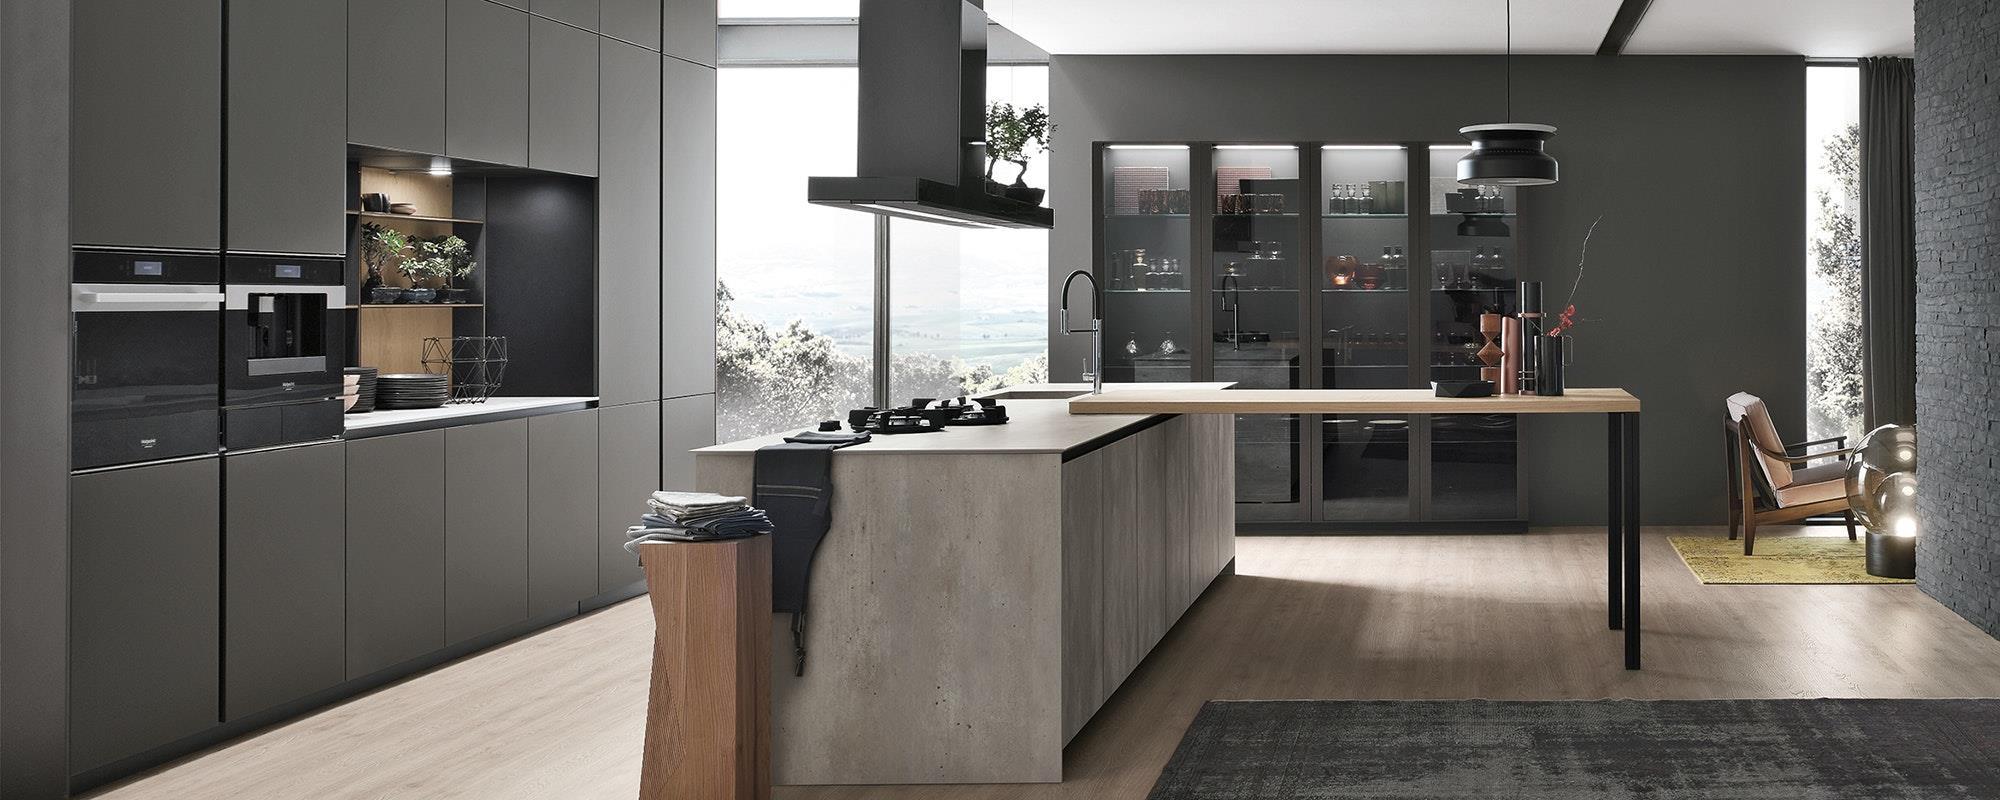 Aliant stosa cucina moderna for Stosa cucine verona